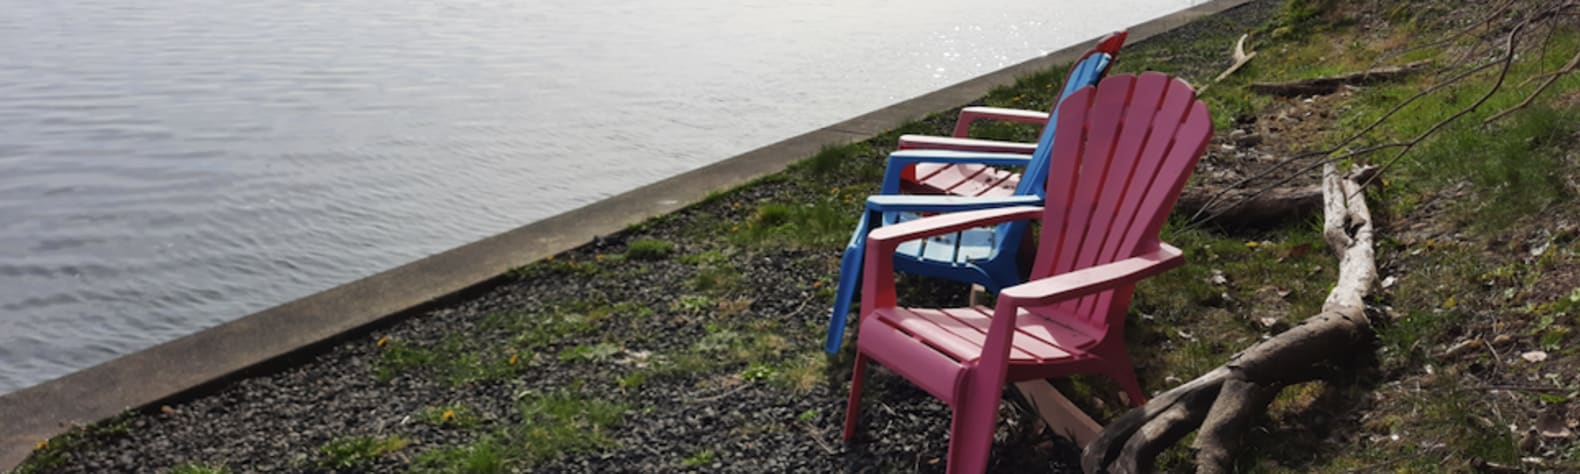 Serenity on Harstine Island!